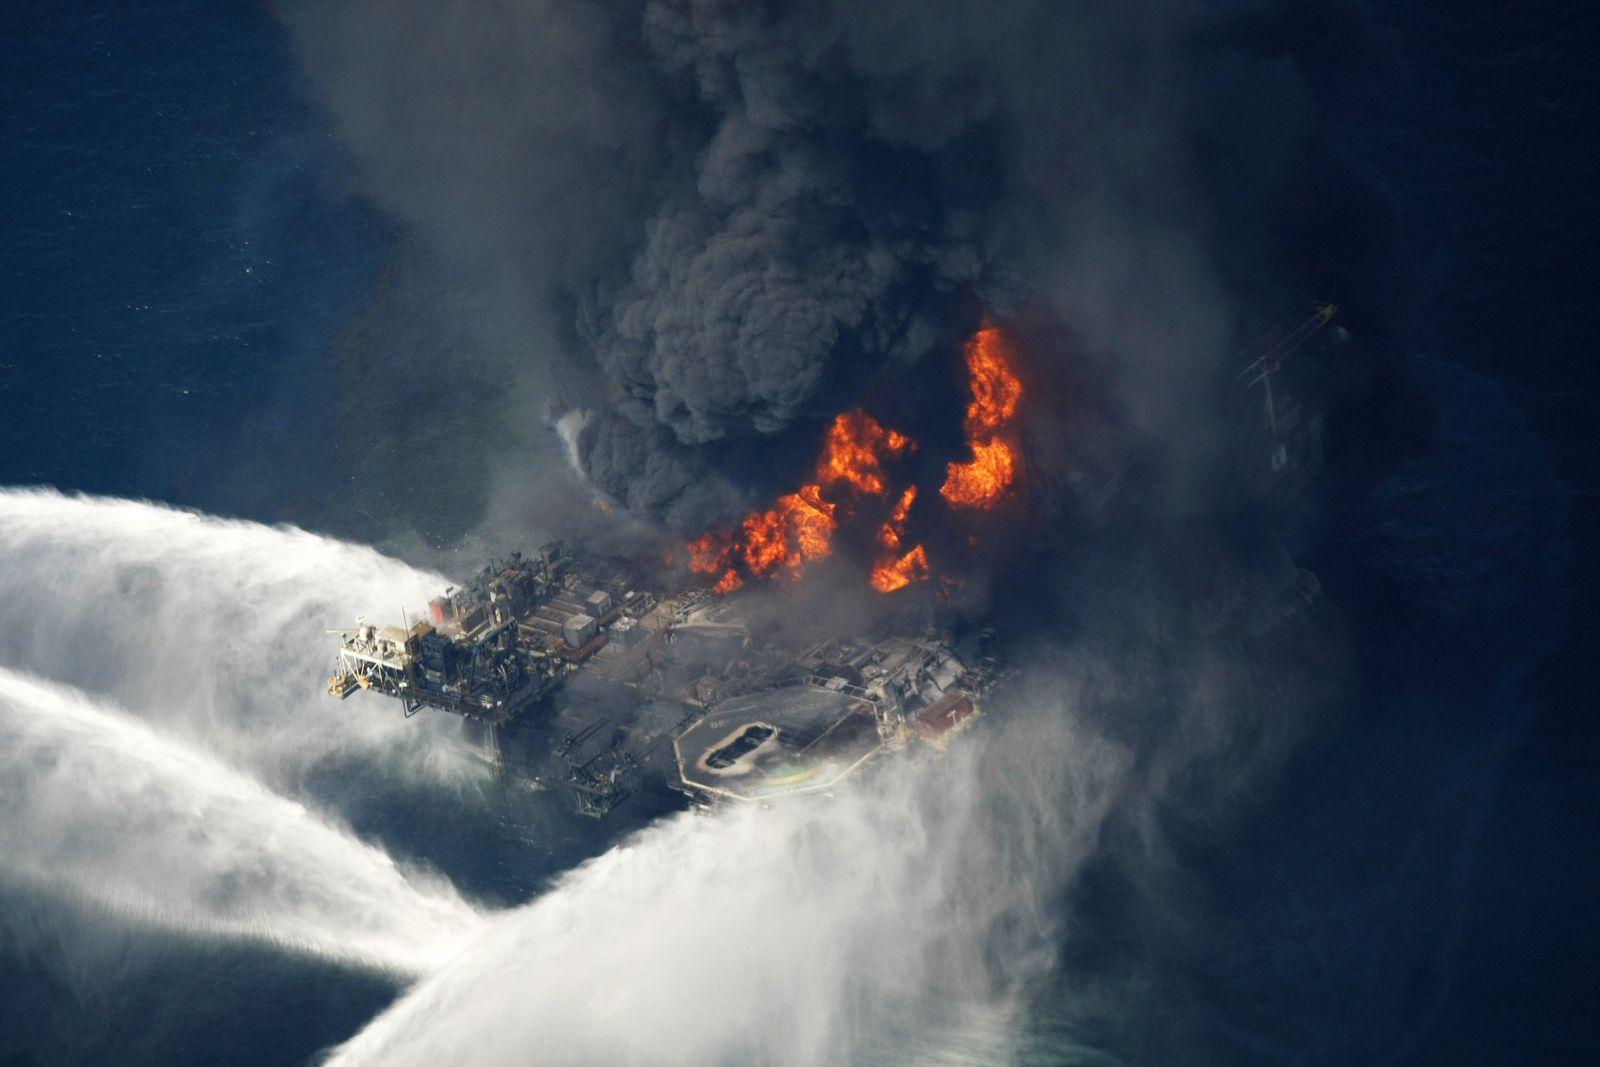 Louisiana / Öl-Bohrinsel-Explosion